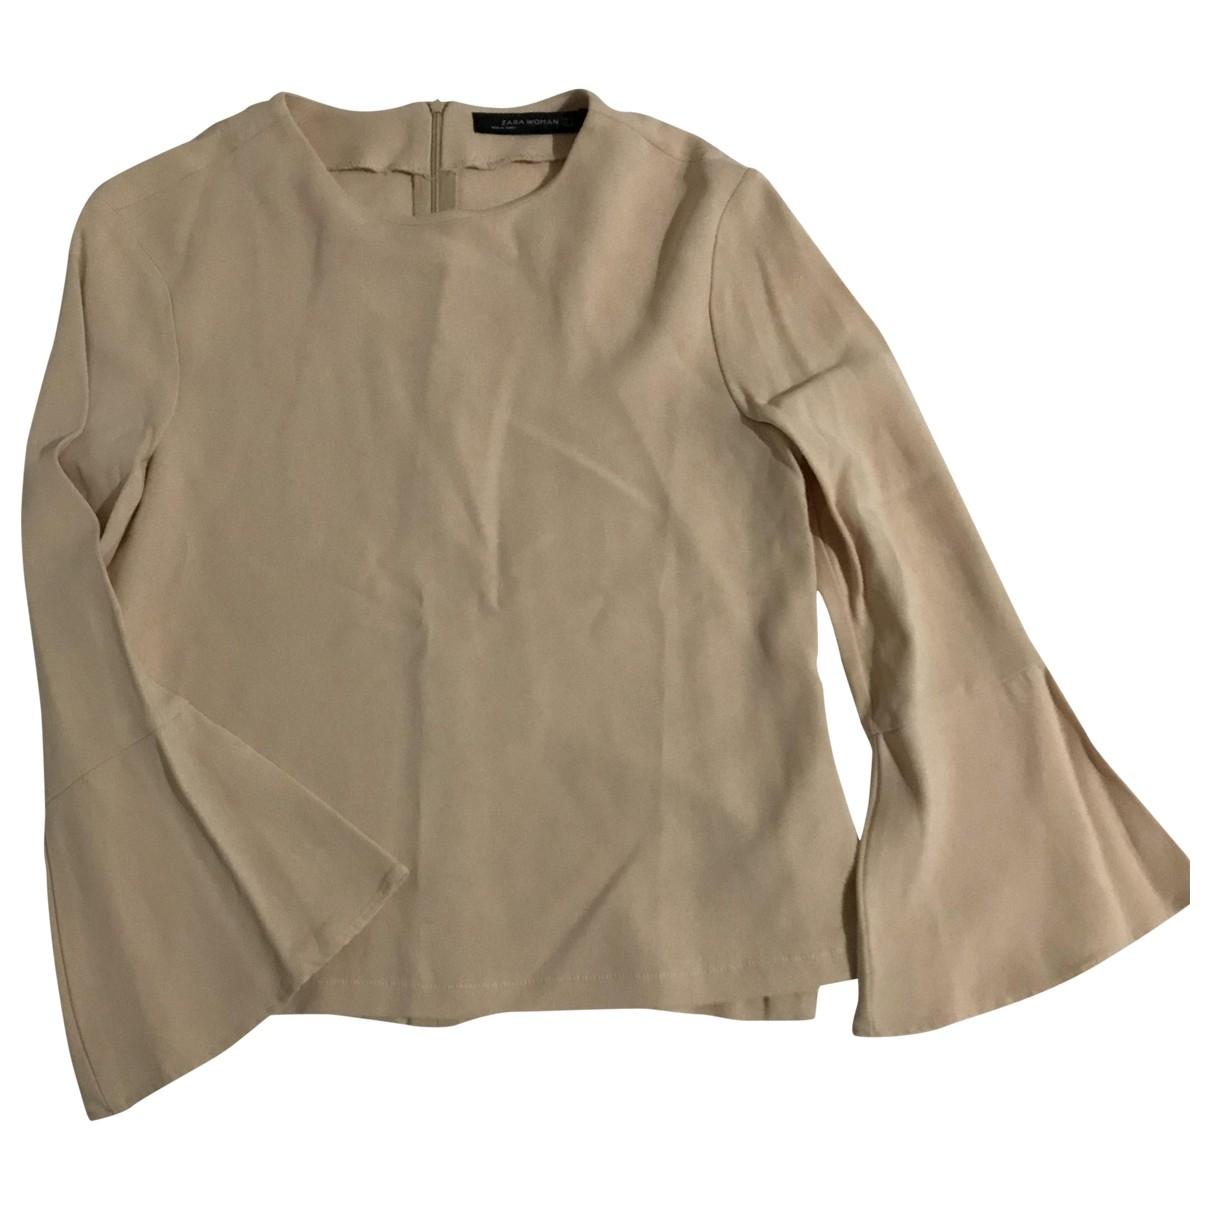 Zara - Pull   pour femme - beige